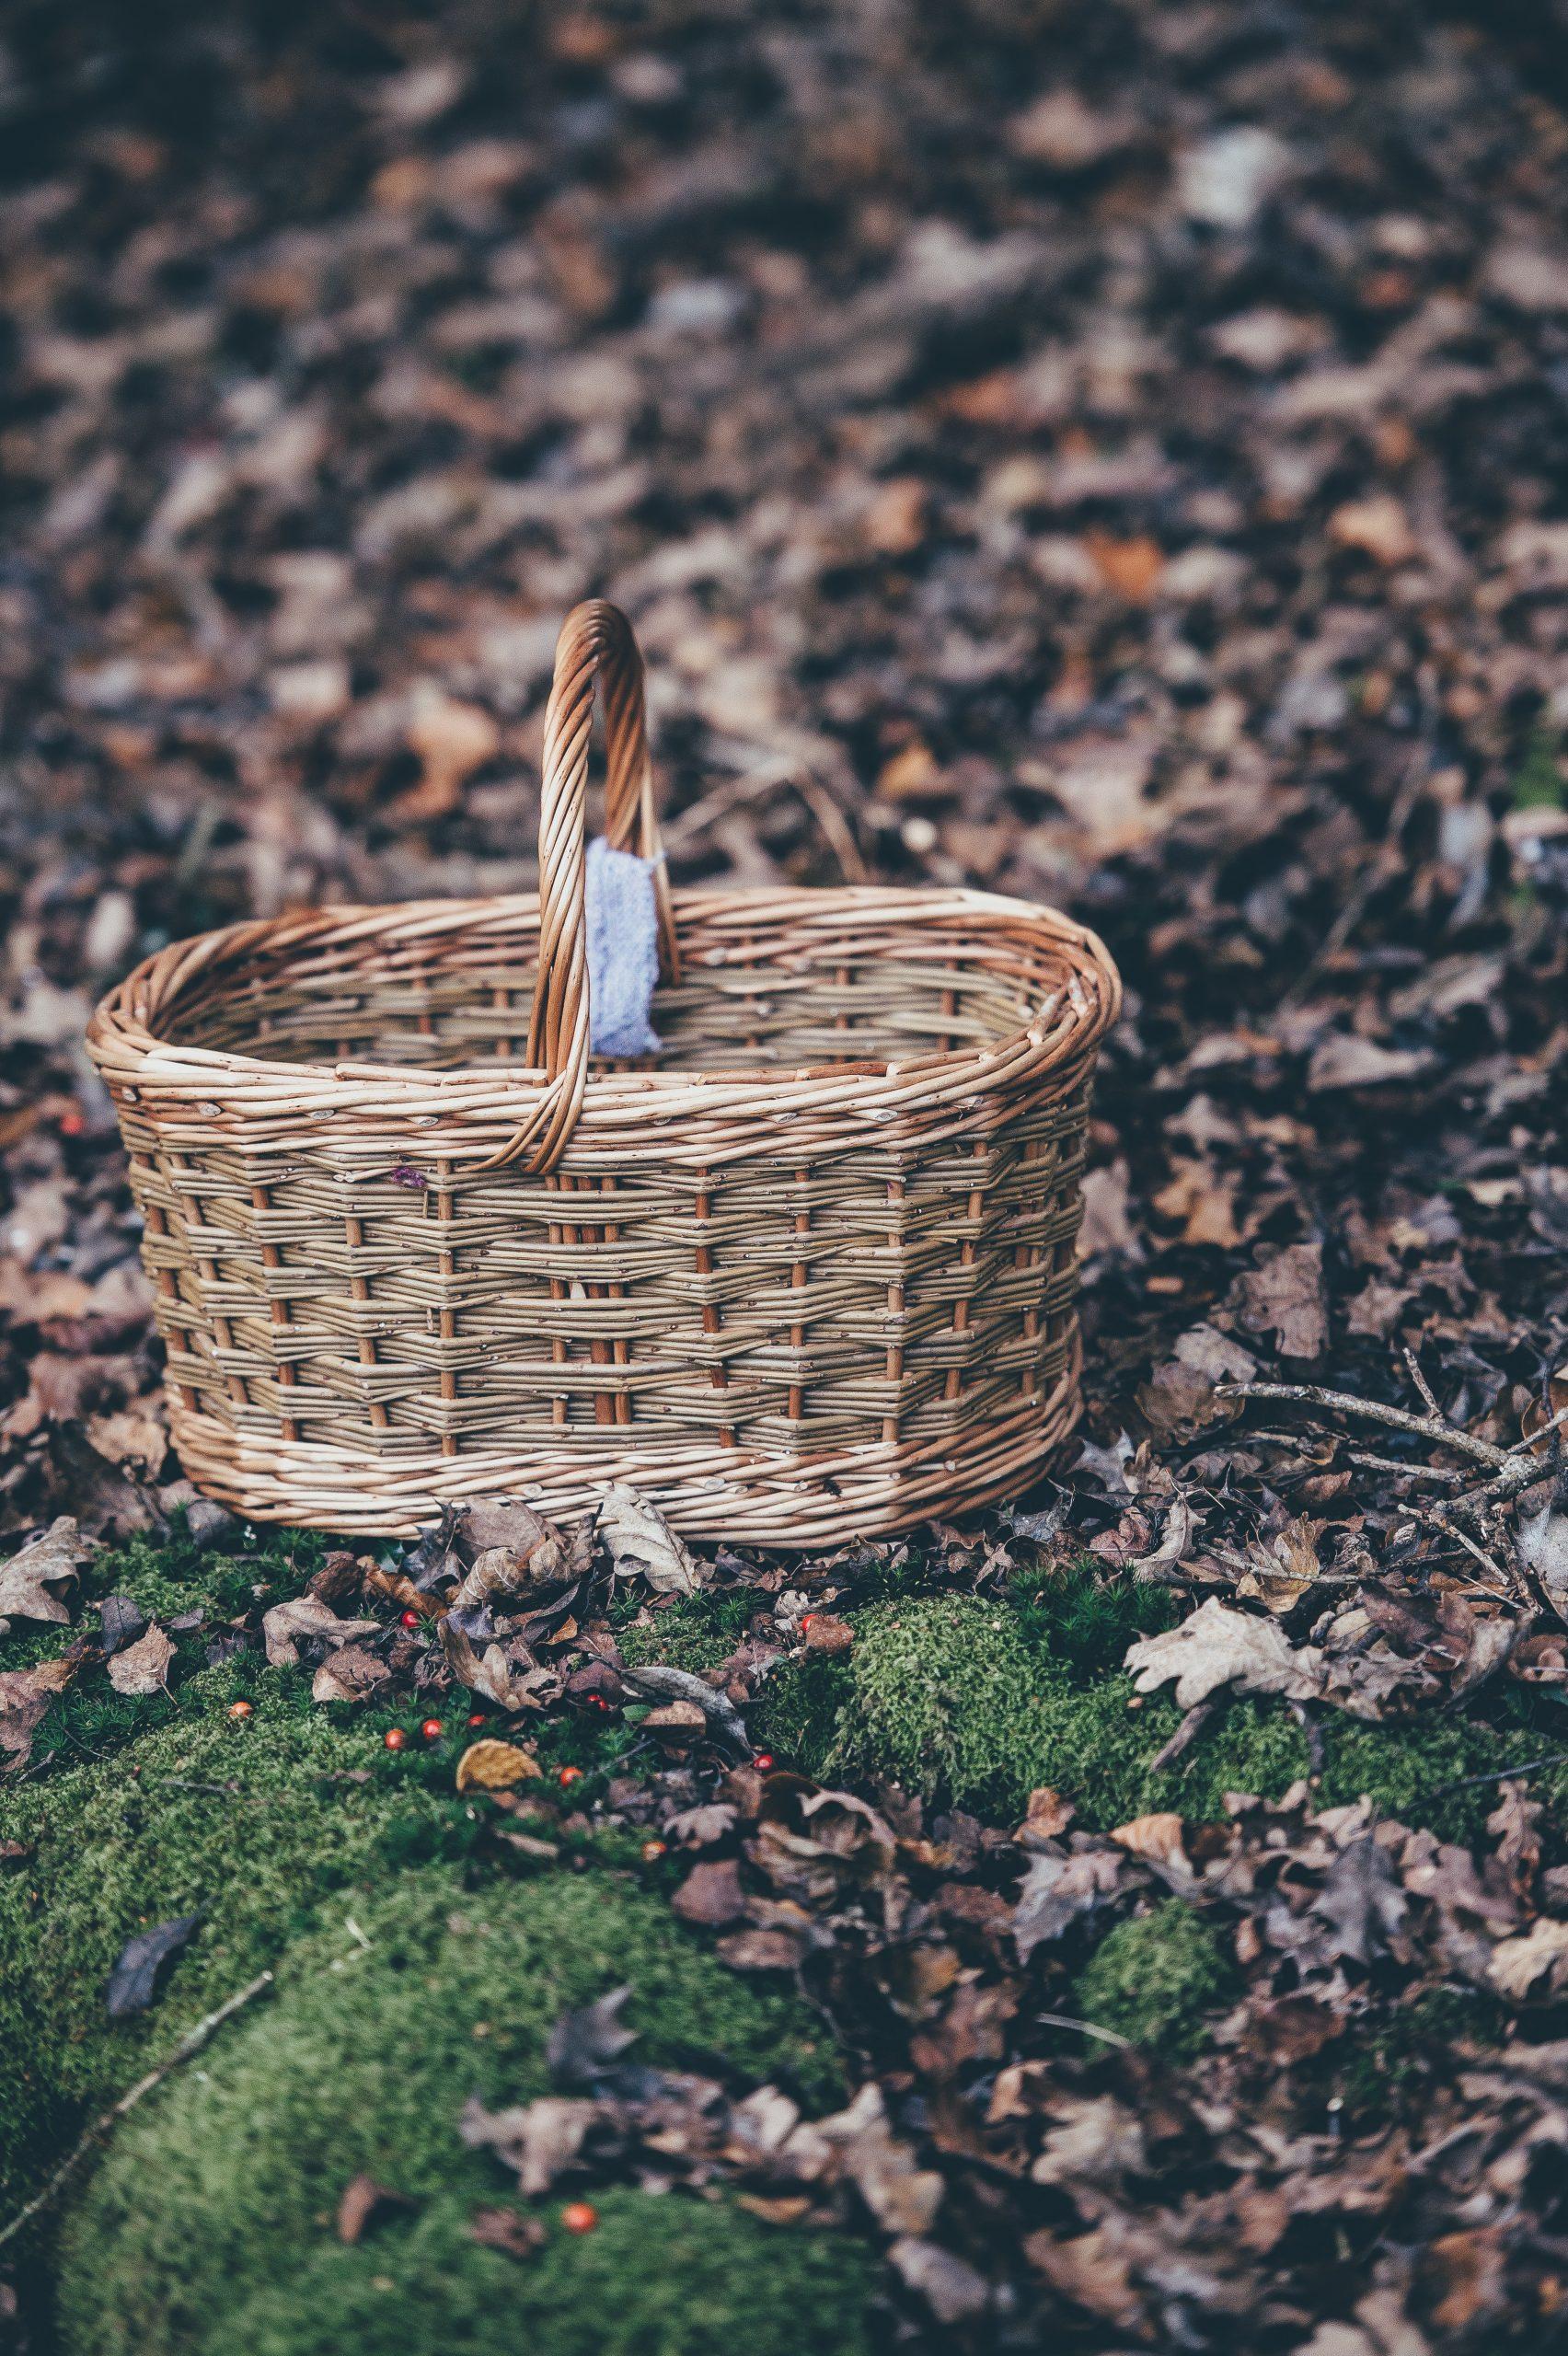 Longaberger basket image